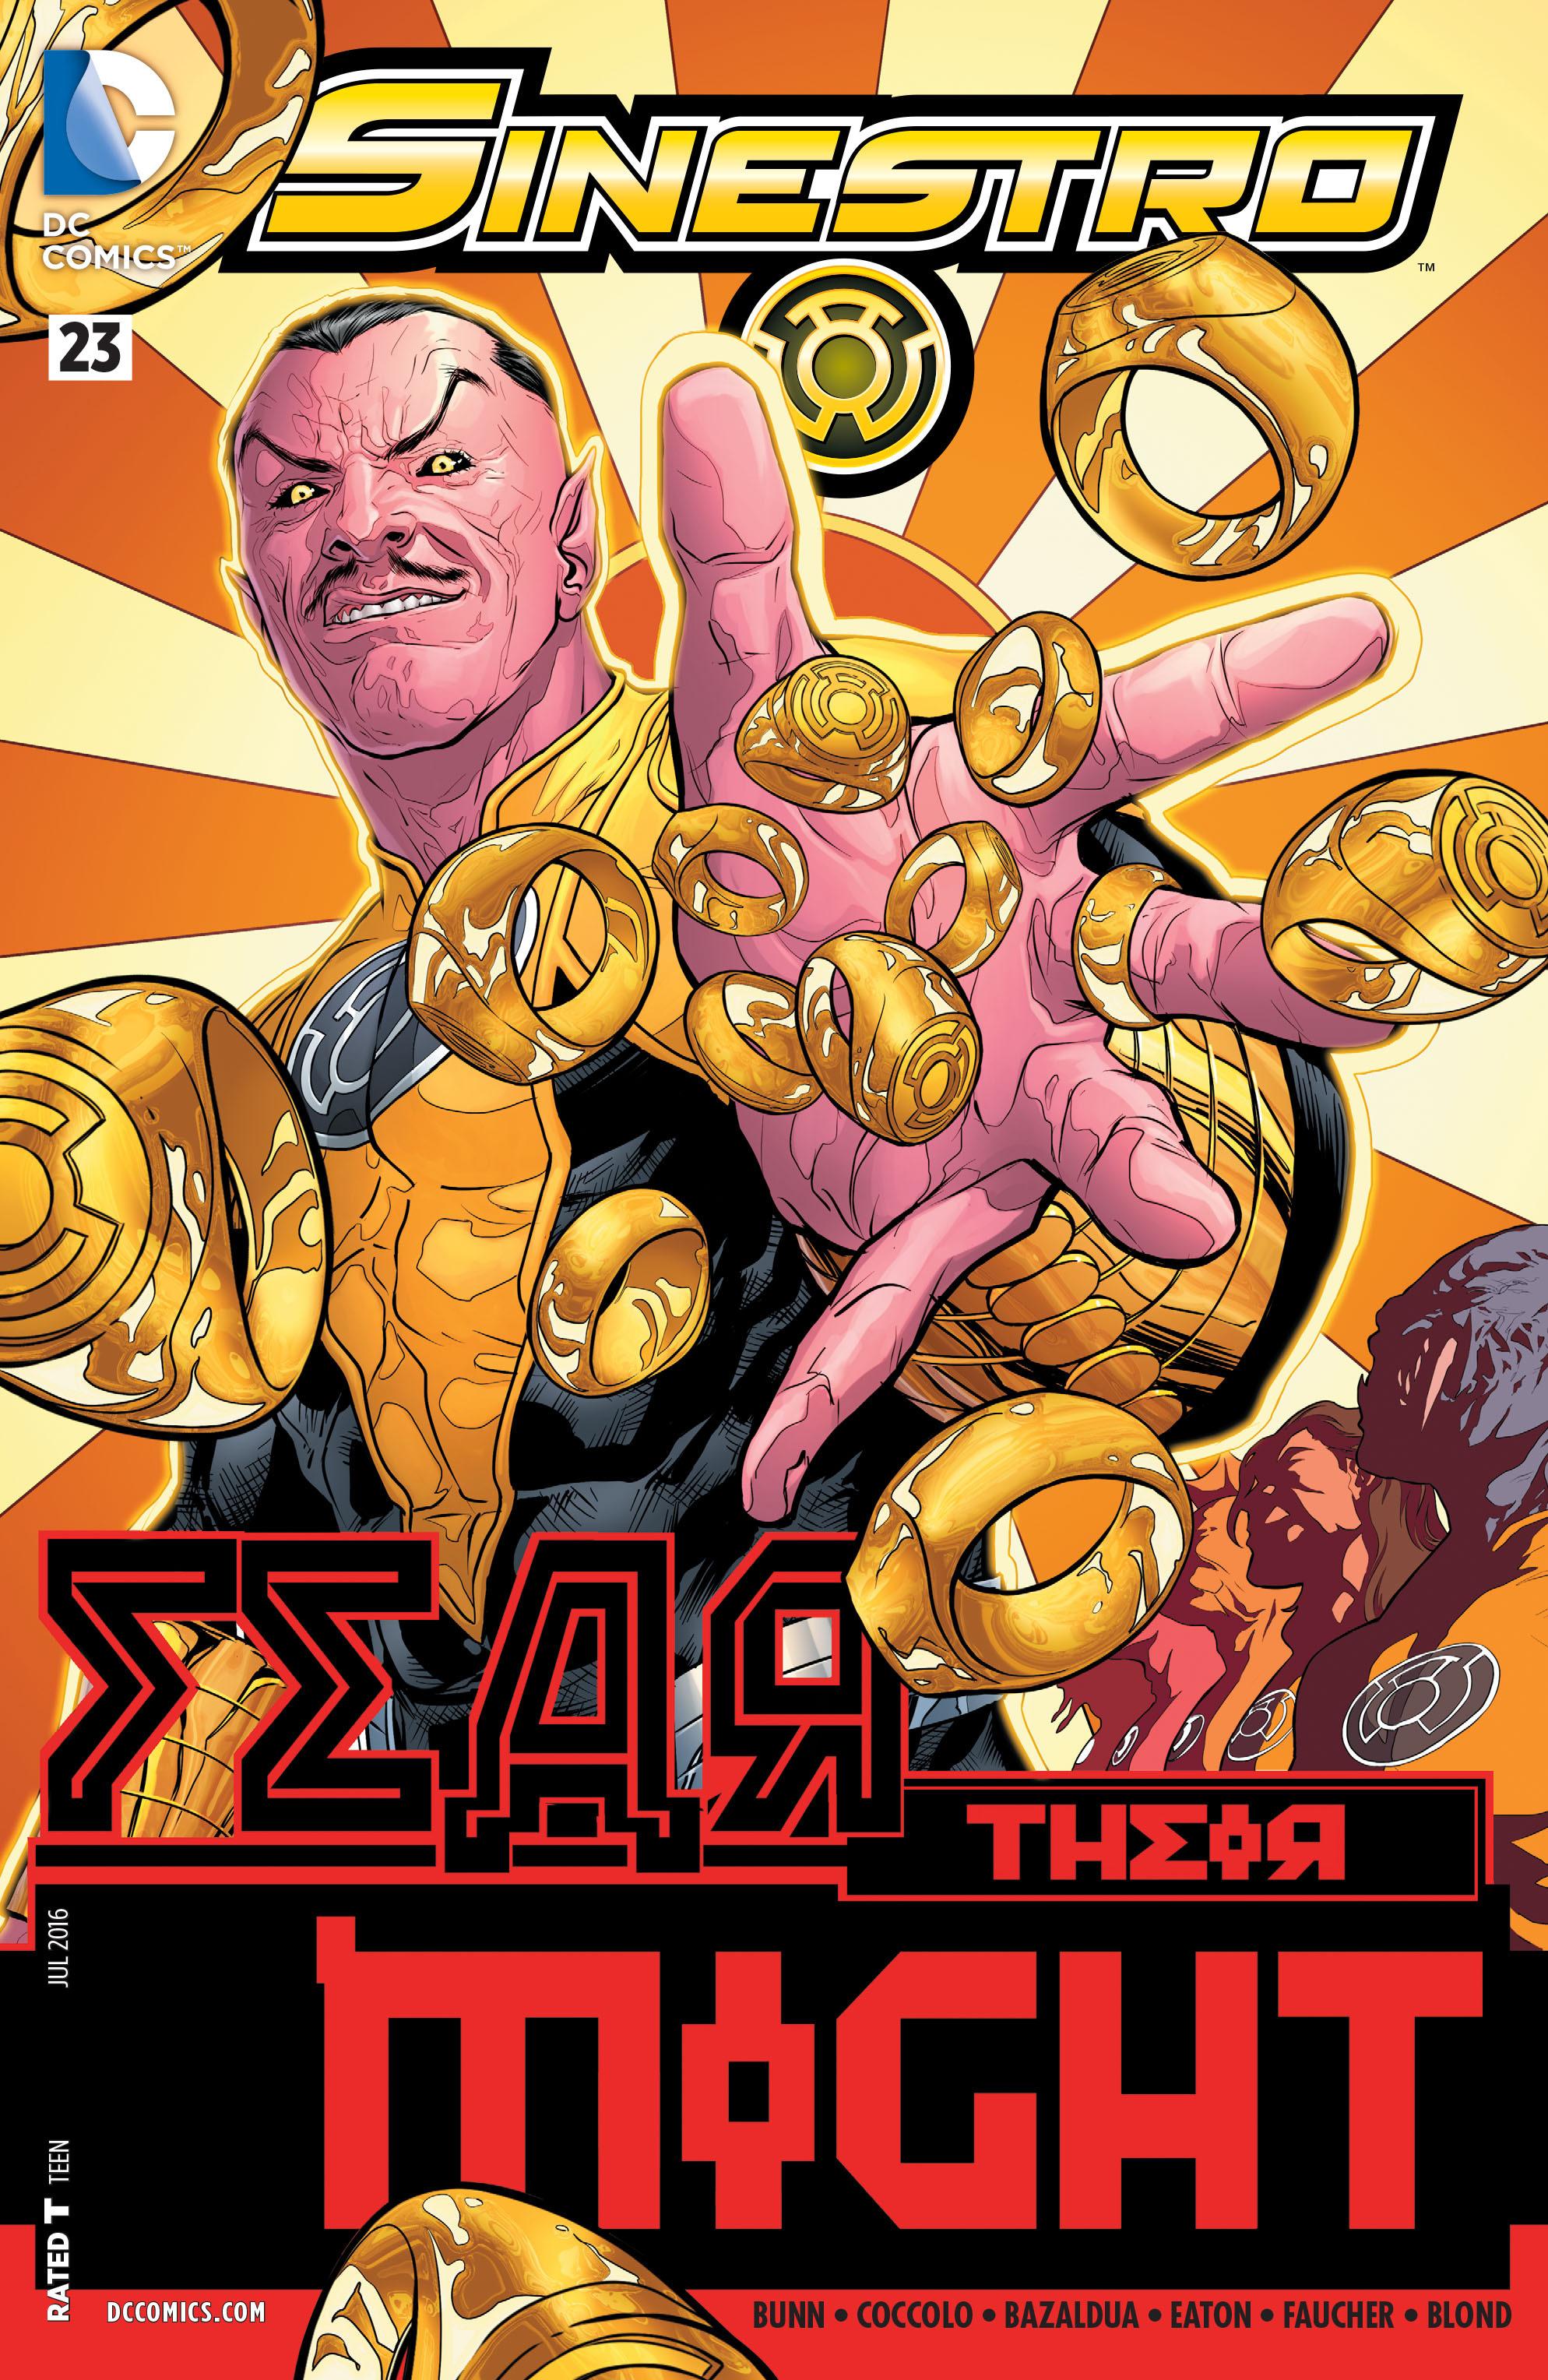 Read online Sinestro comic -  Issue #23 - 1